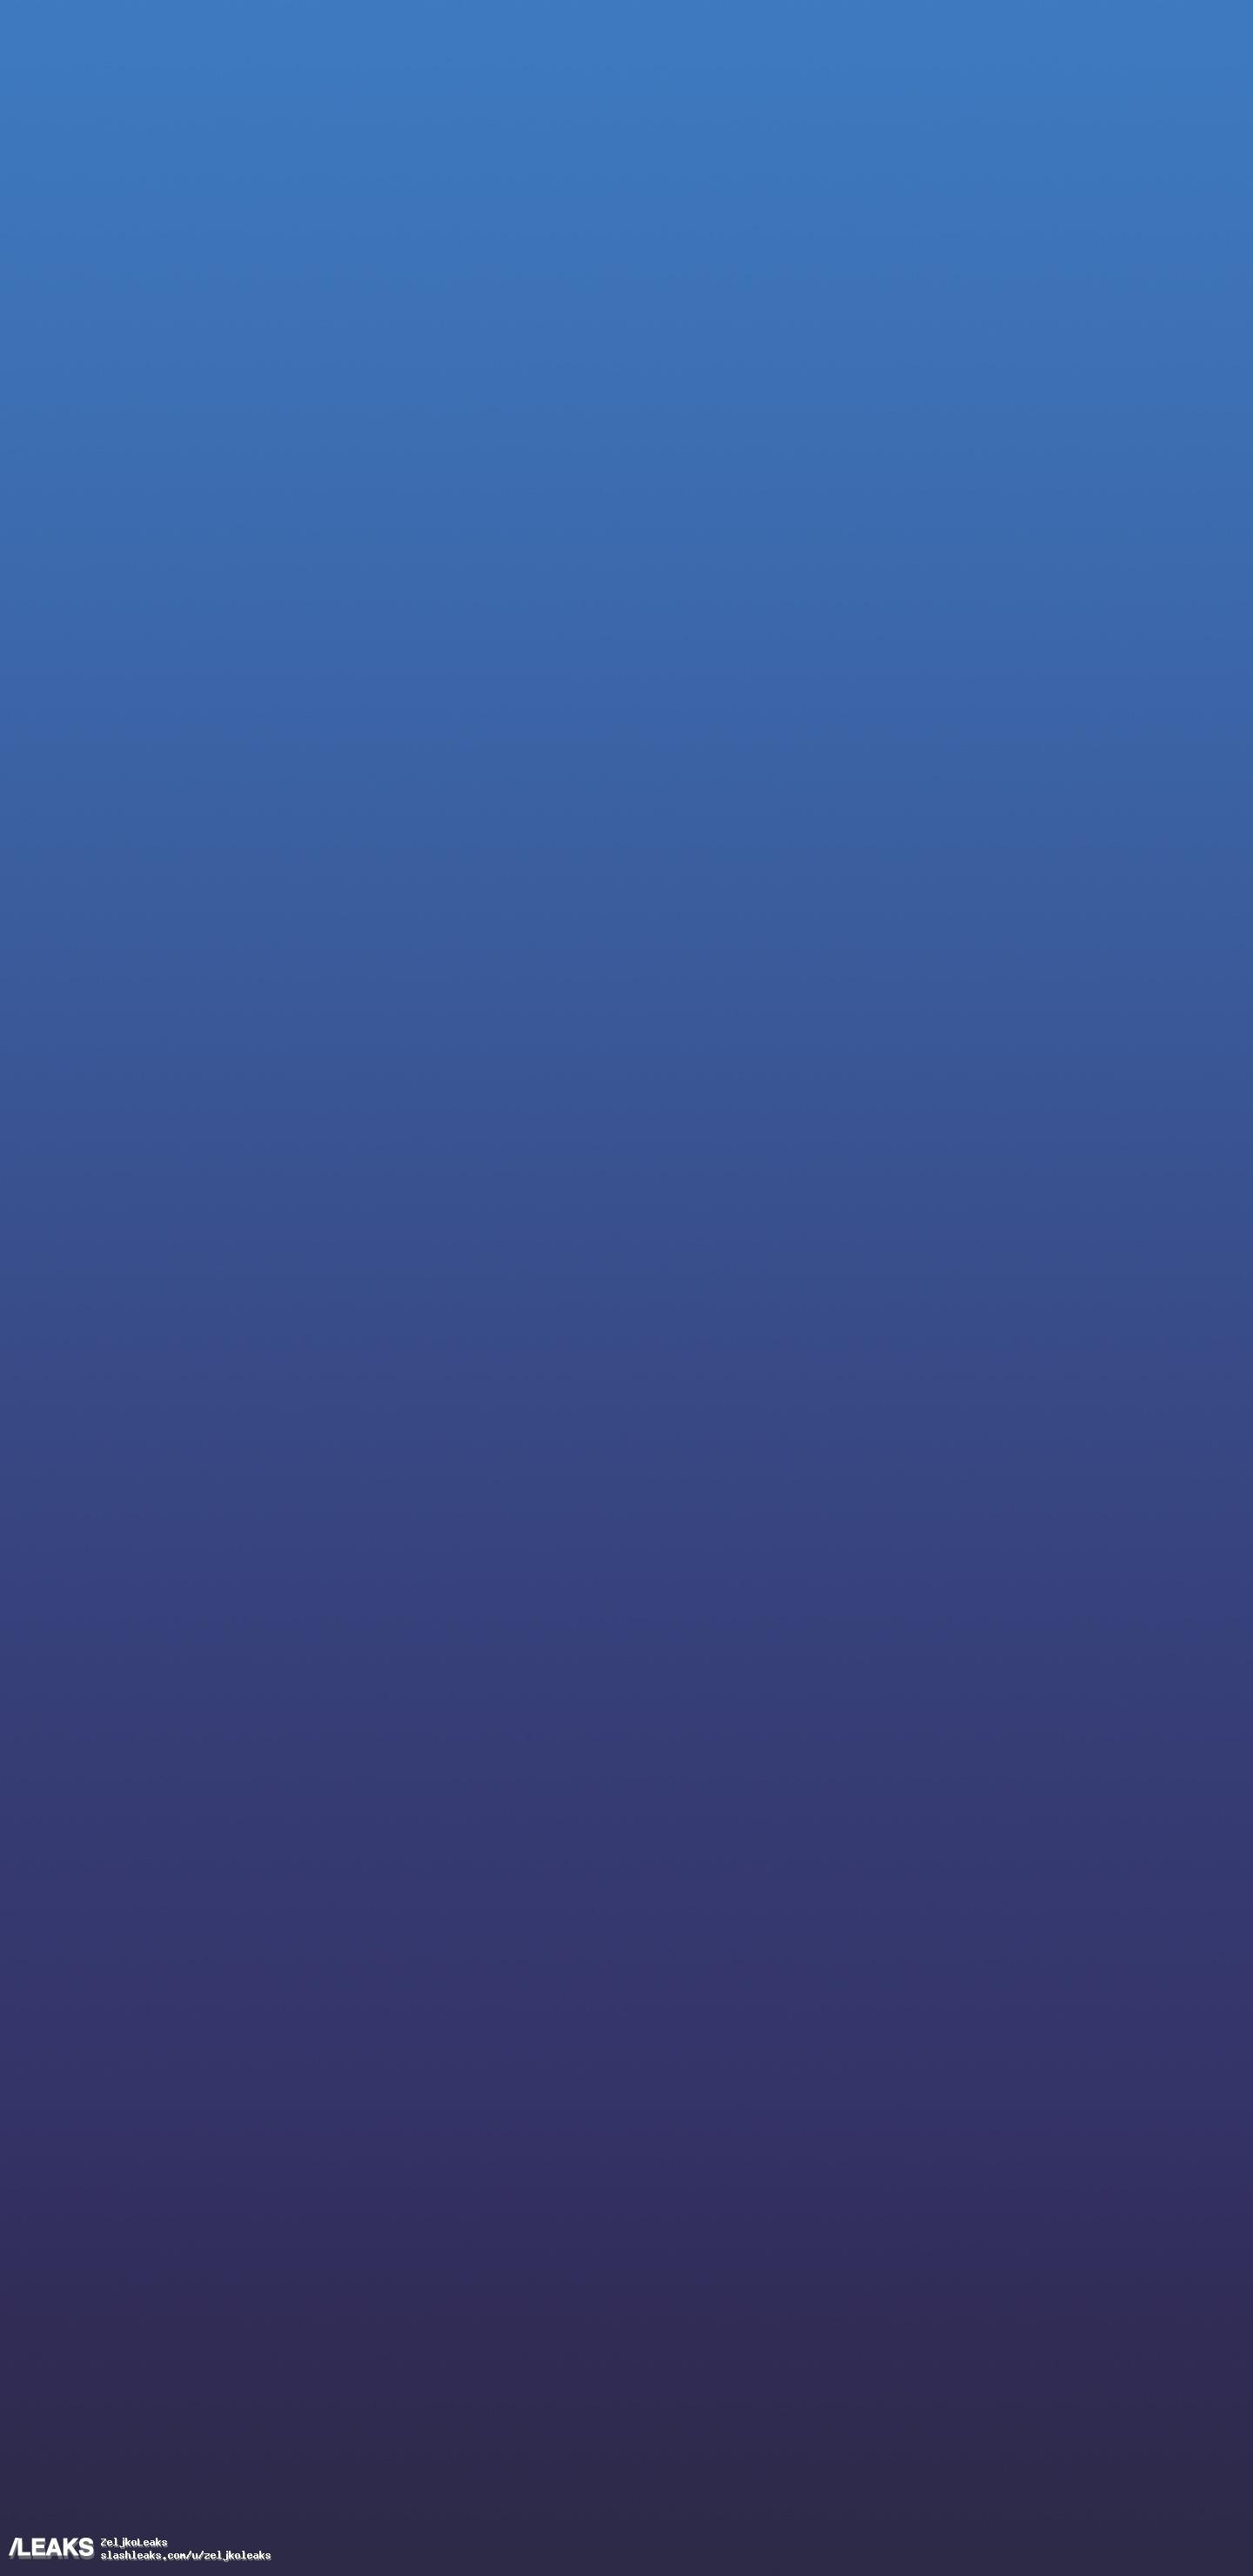 Blue, clean, background, colour, wallpaper, galaxy, calming, s8,